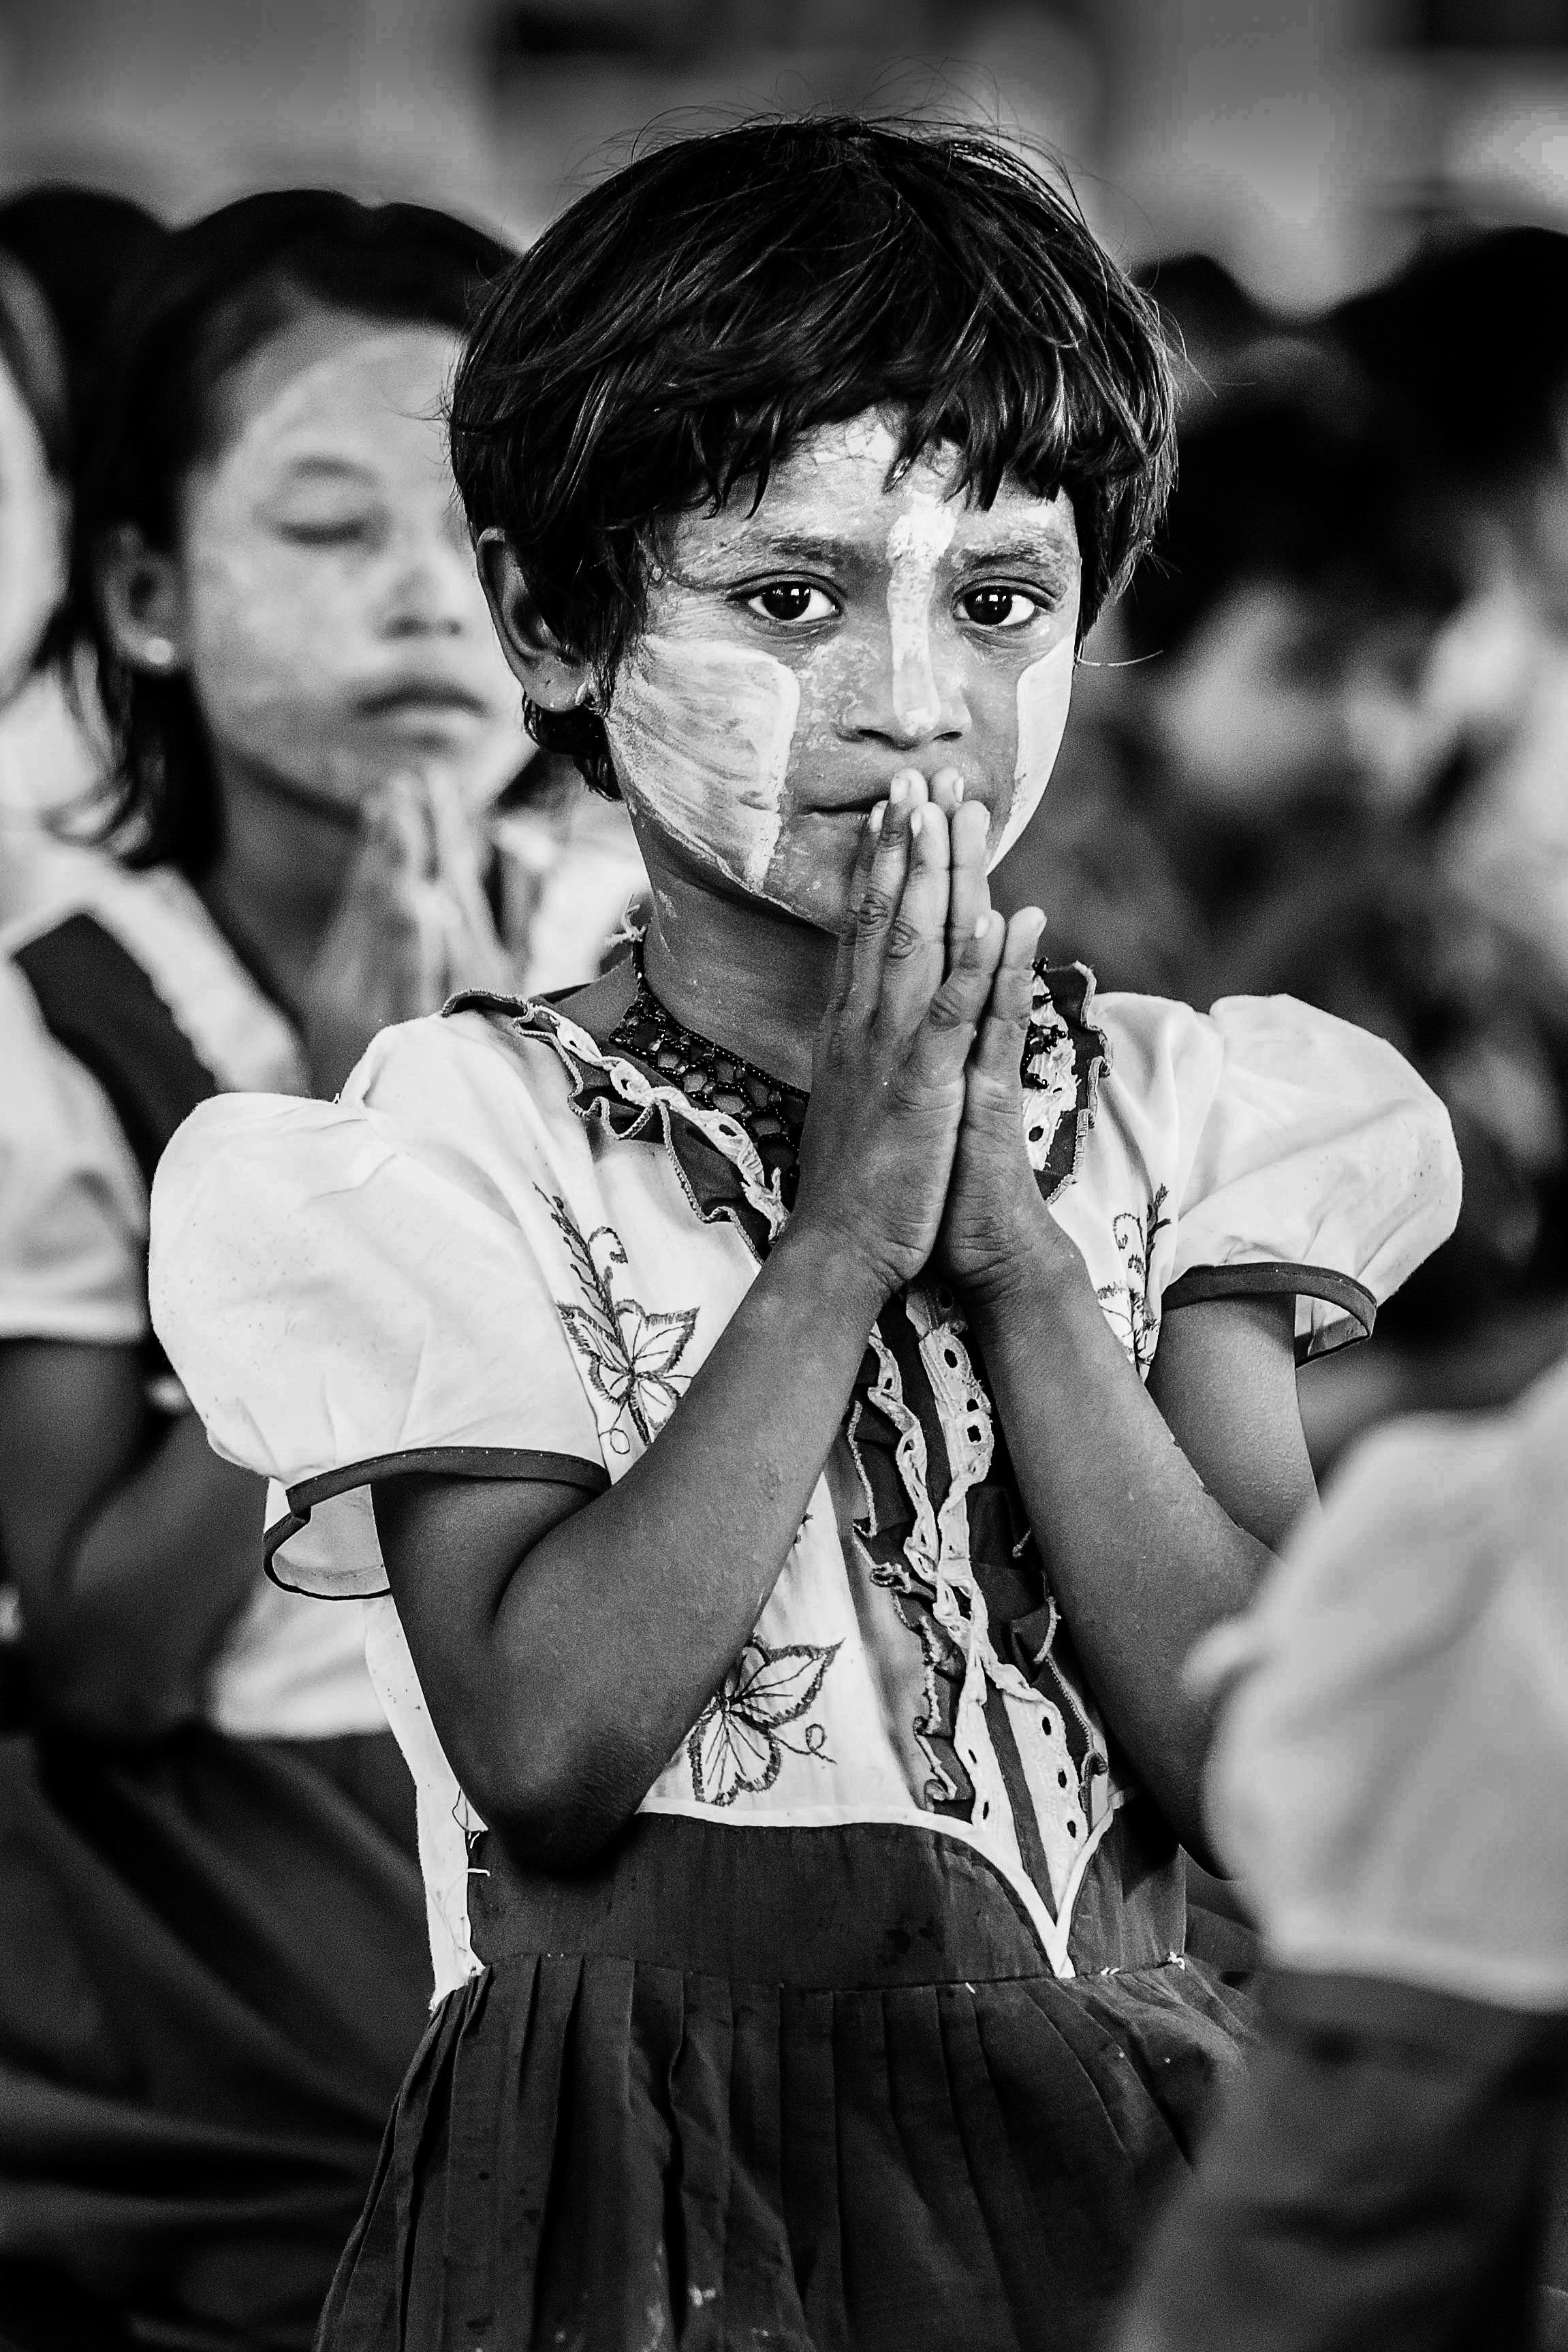 Female student during Prayers at the Alaikyanug Pariyatti Monastic Education School, Alikyaung Dalla Township, Yangon, Myanmar